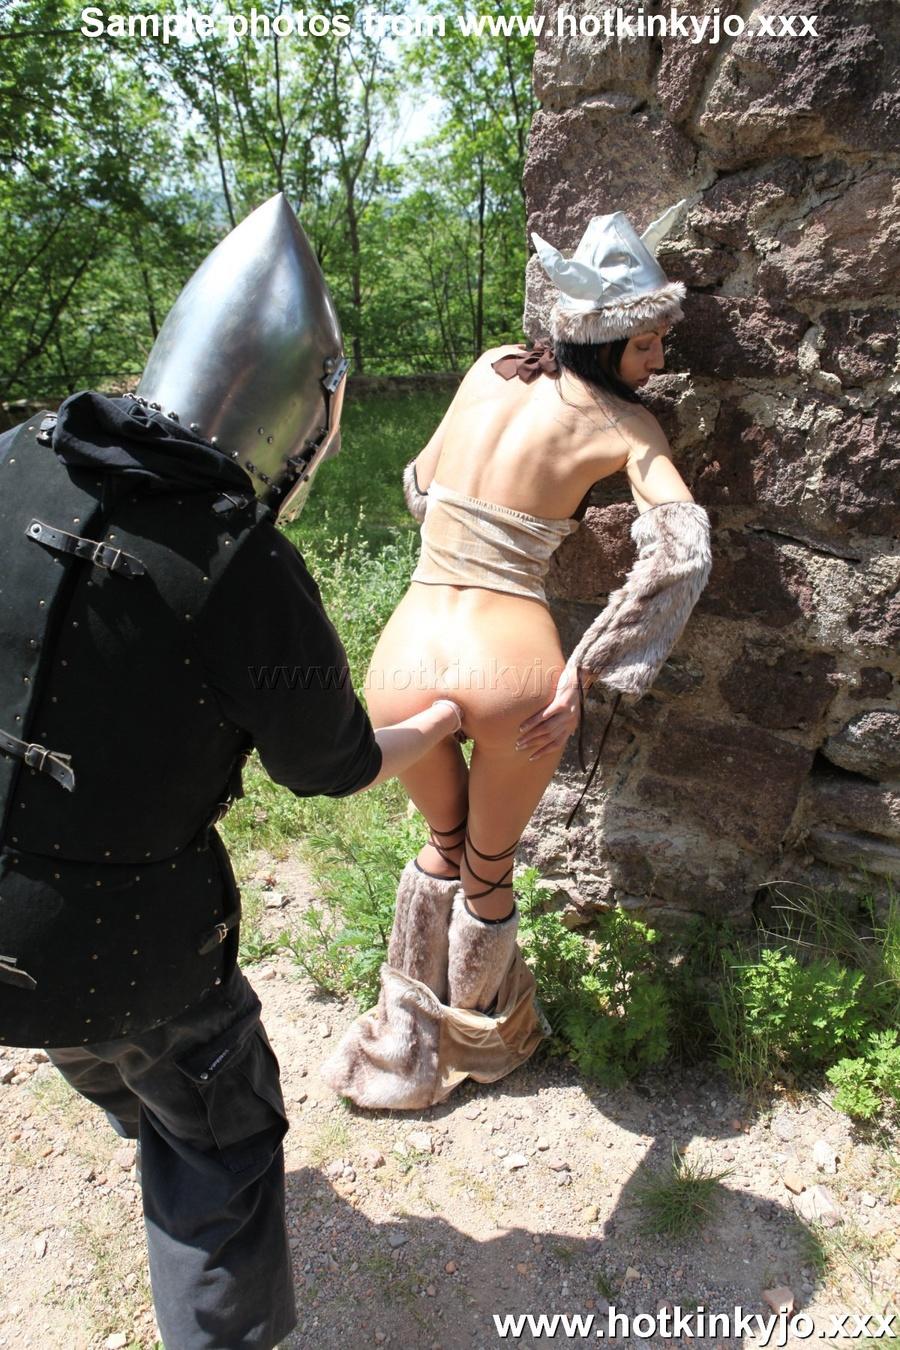 Free medieval porn movies - 3 part 4